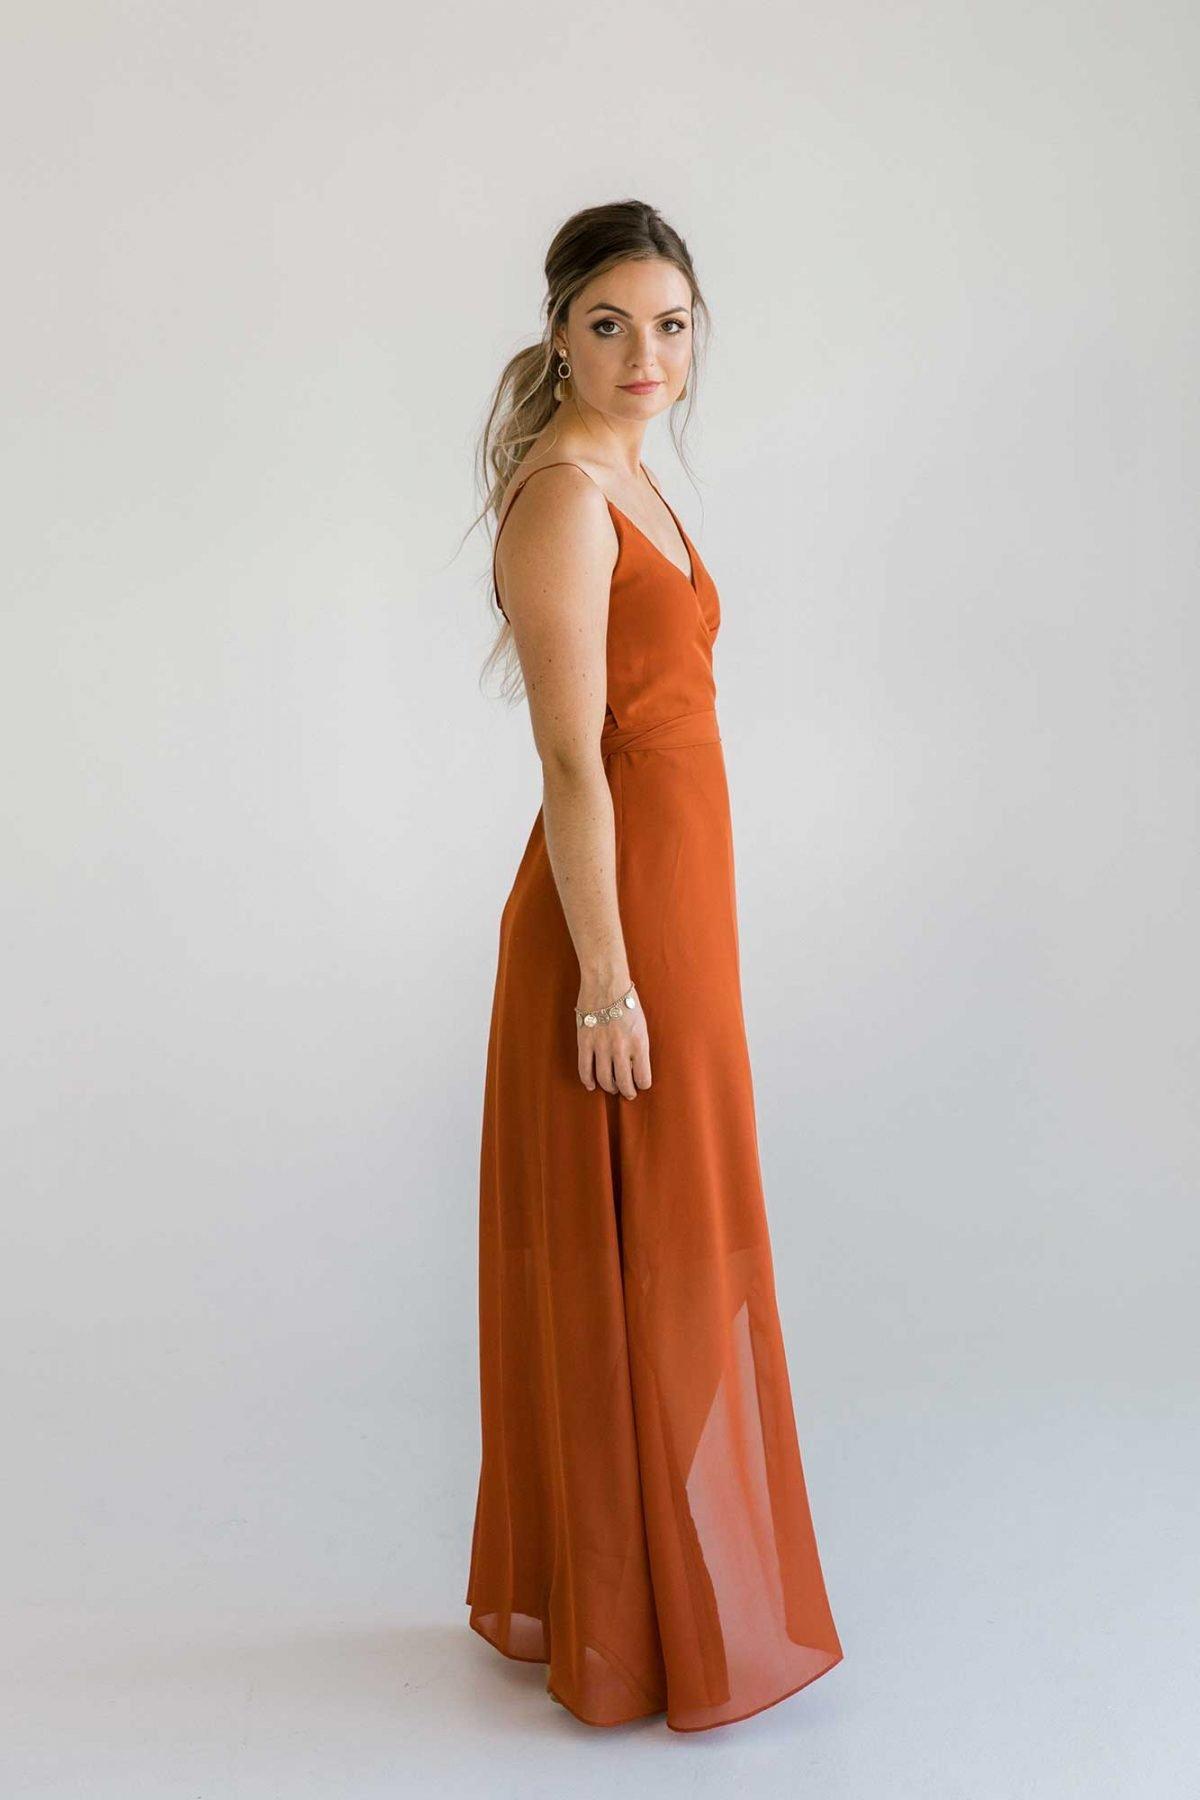 Lucinda dress in burnt orange colour side view